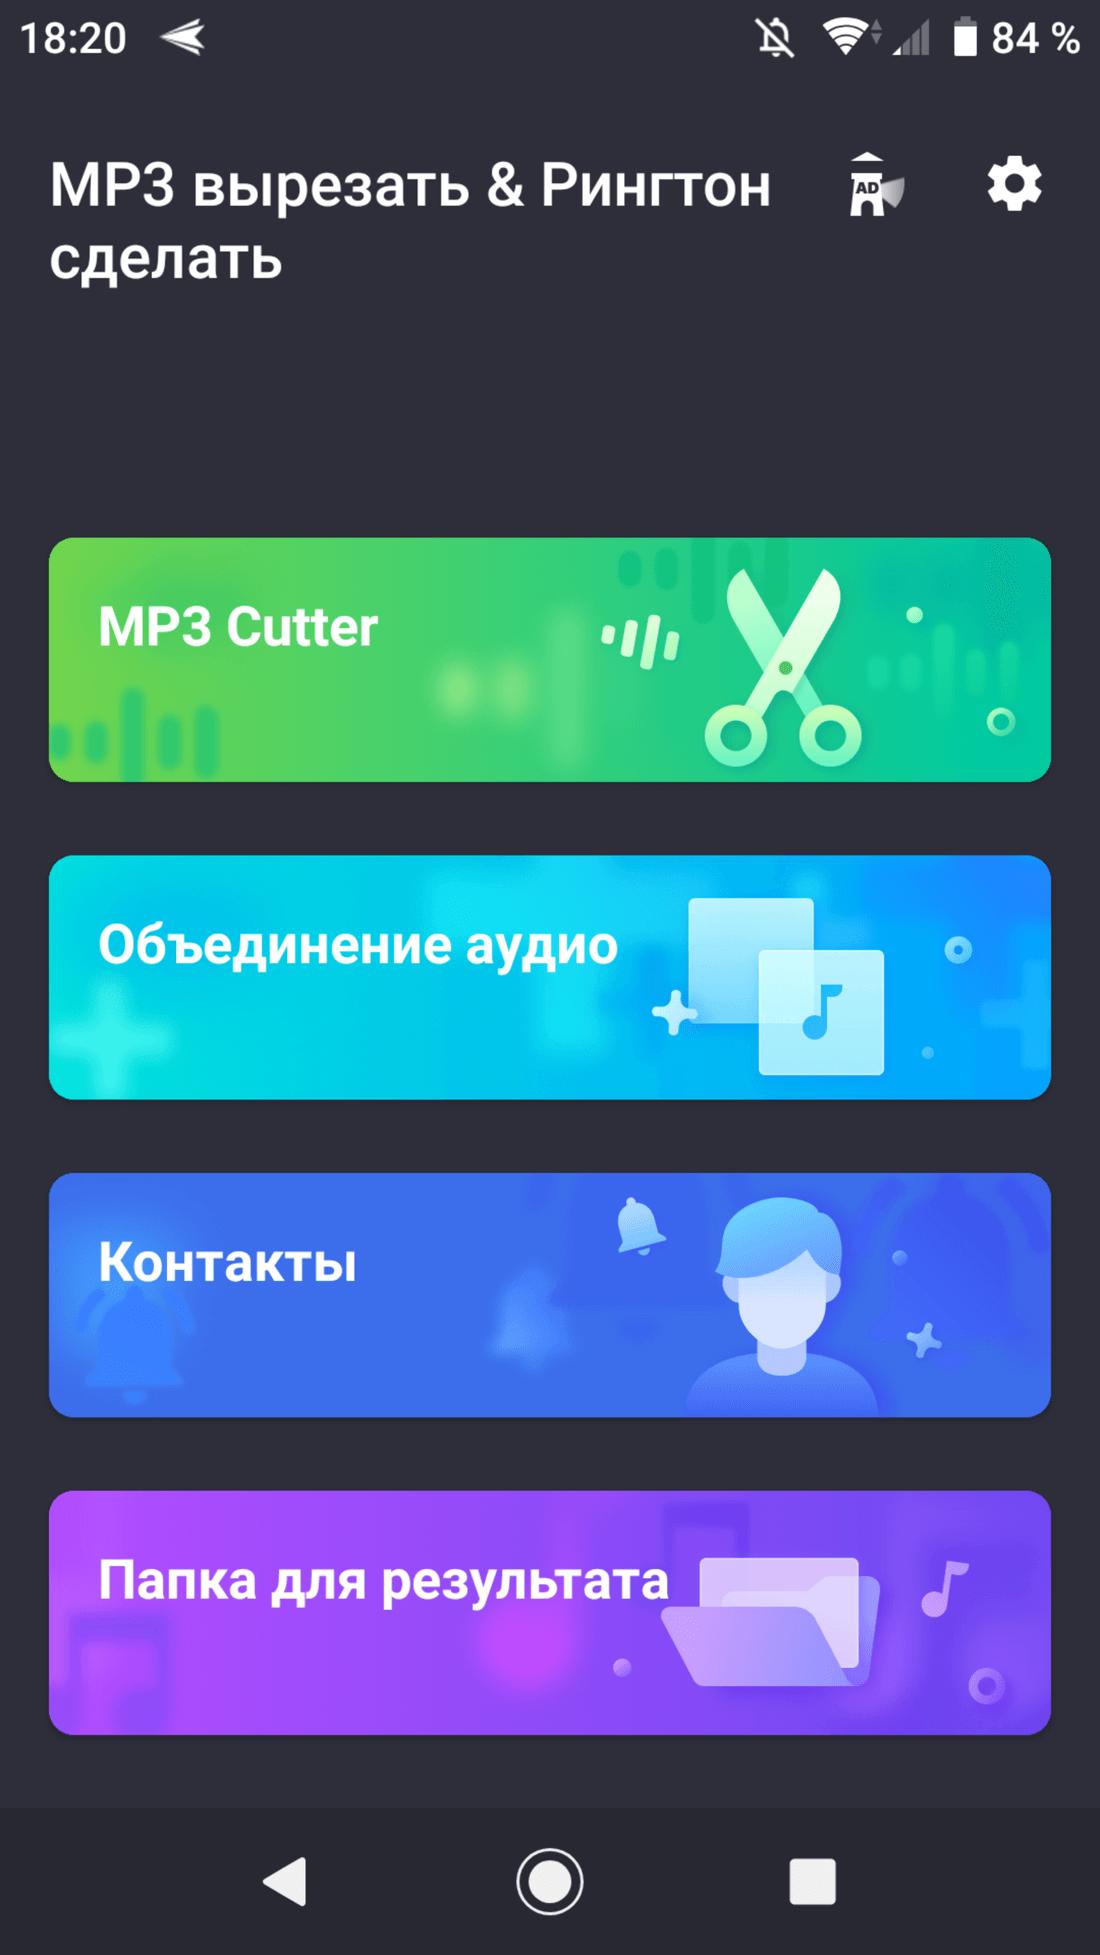 Скриншот #2 из программы MP3 Cutter & Ringtone Maker